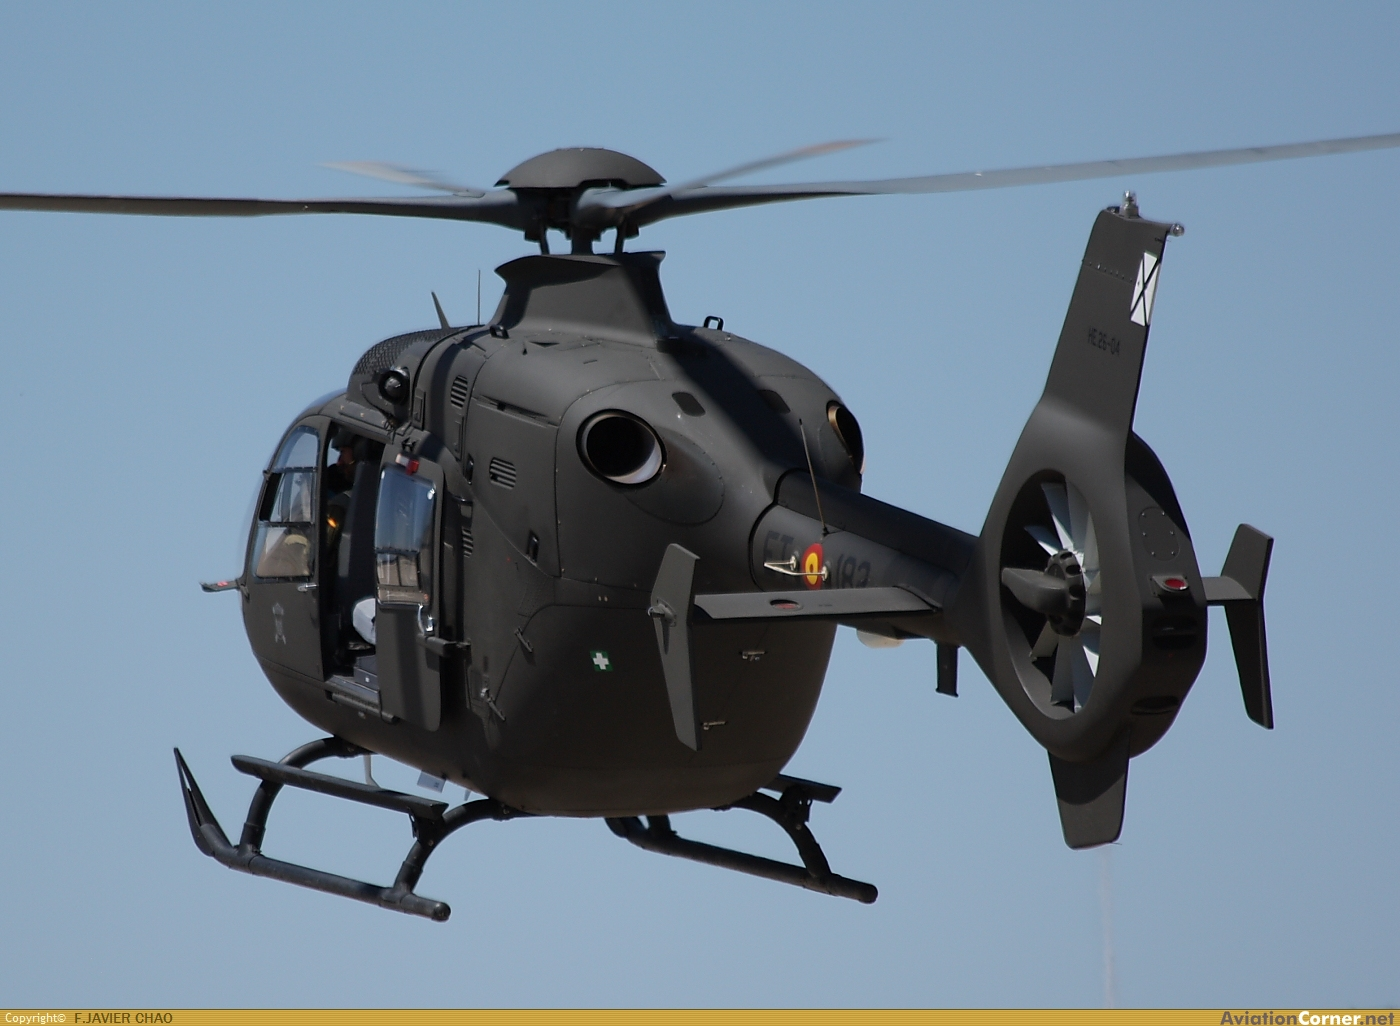 ejercito fuerza aerea: